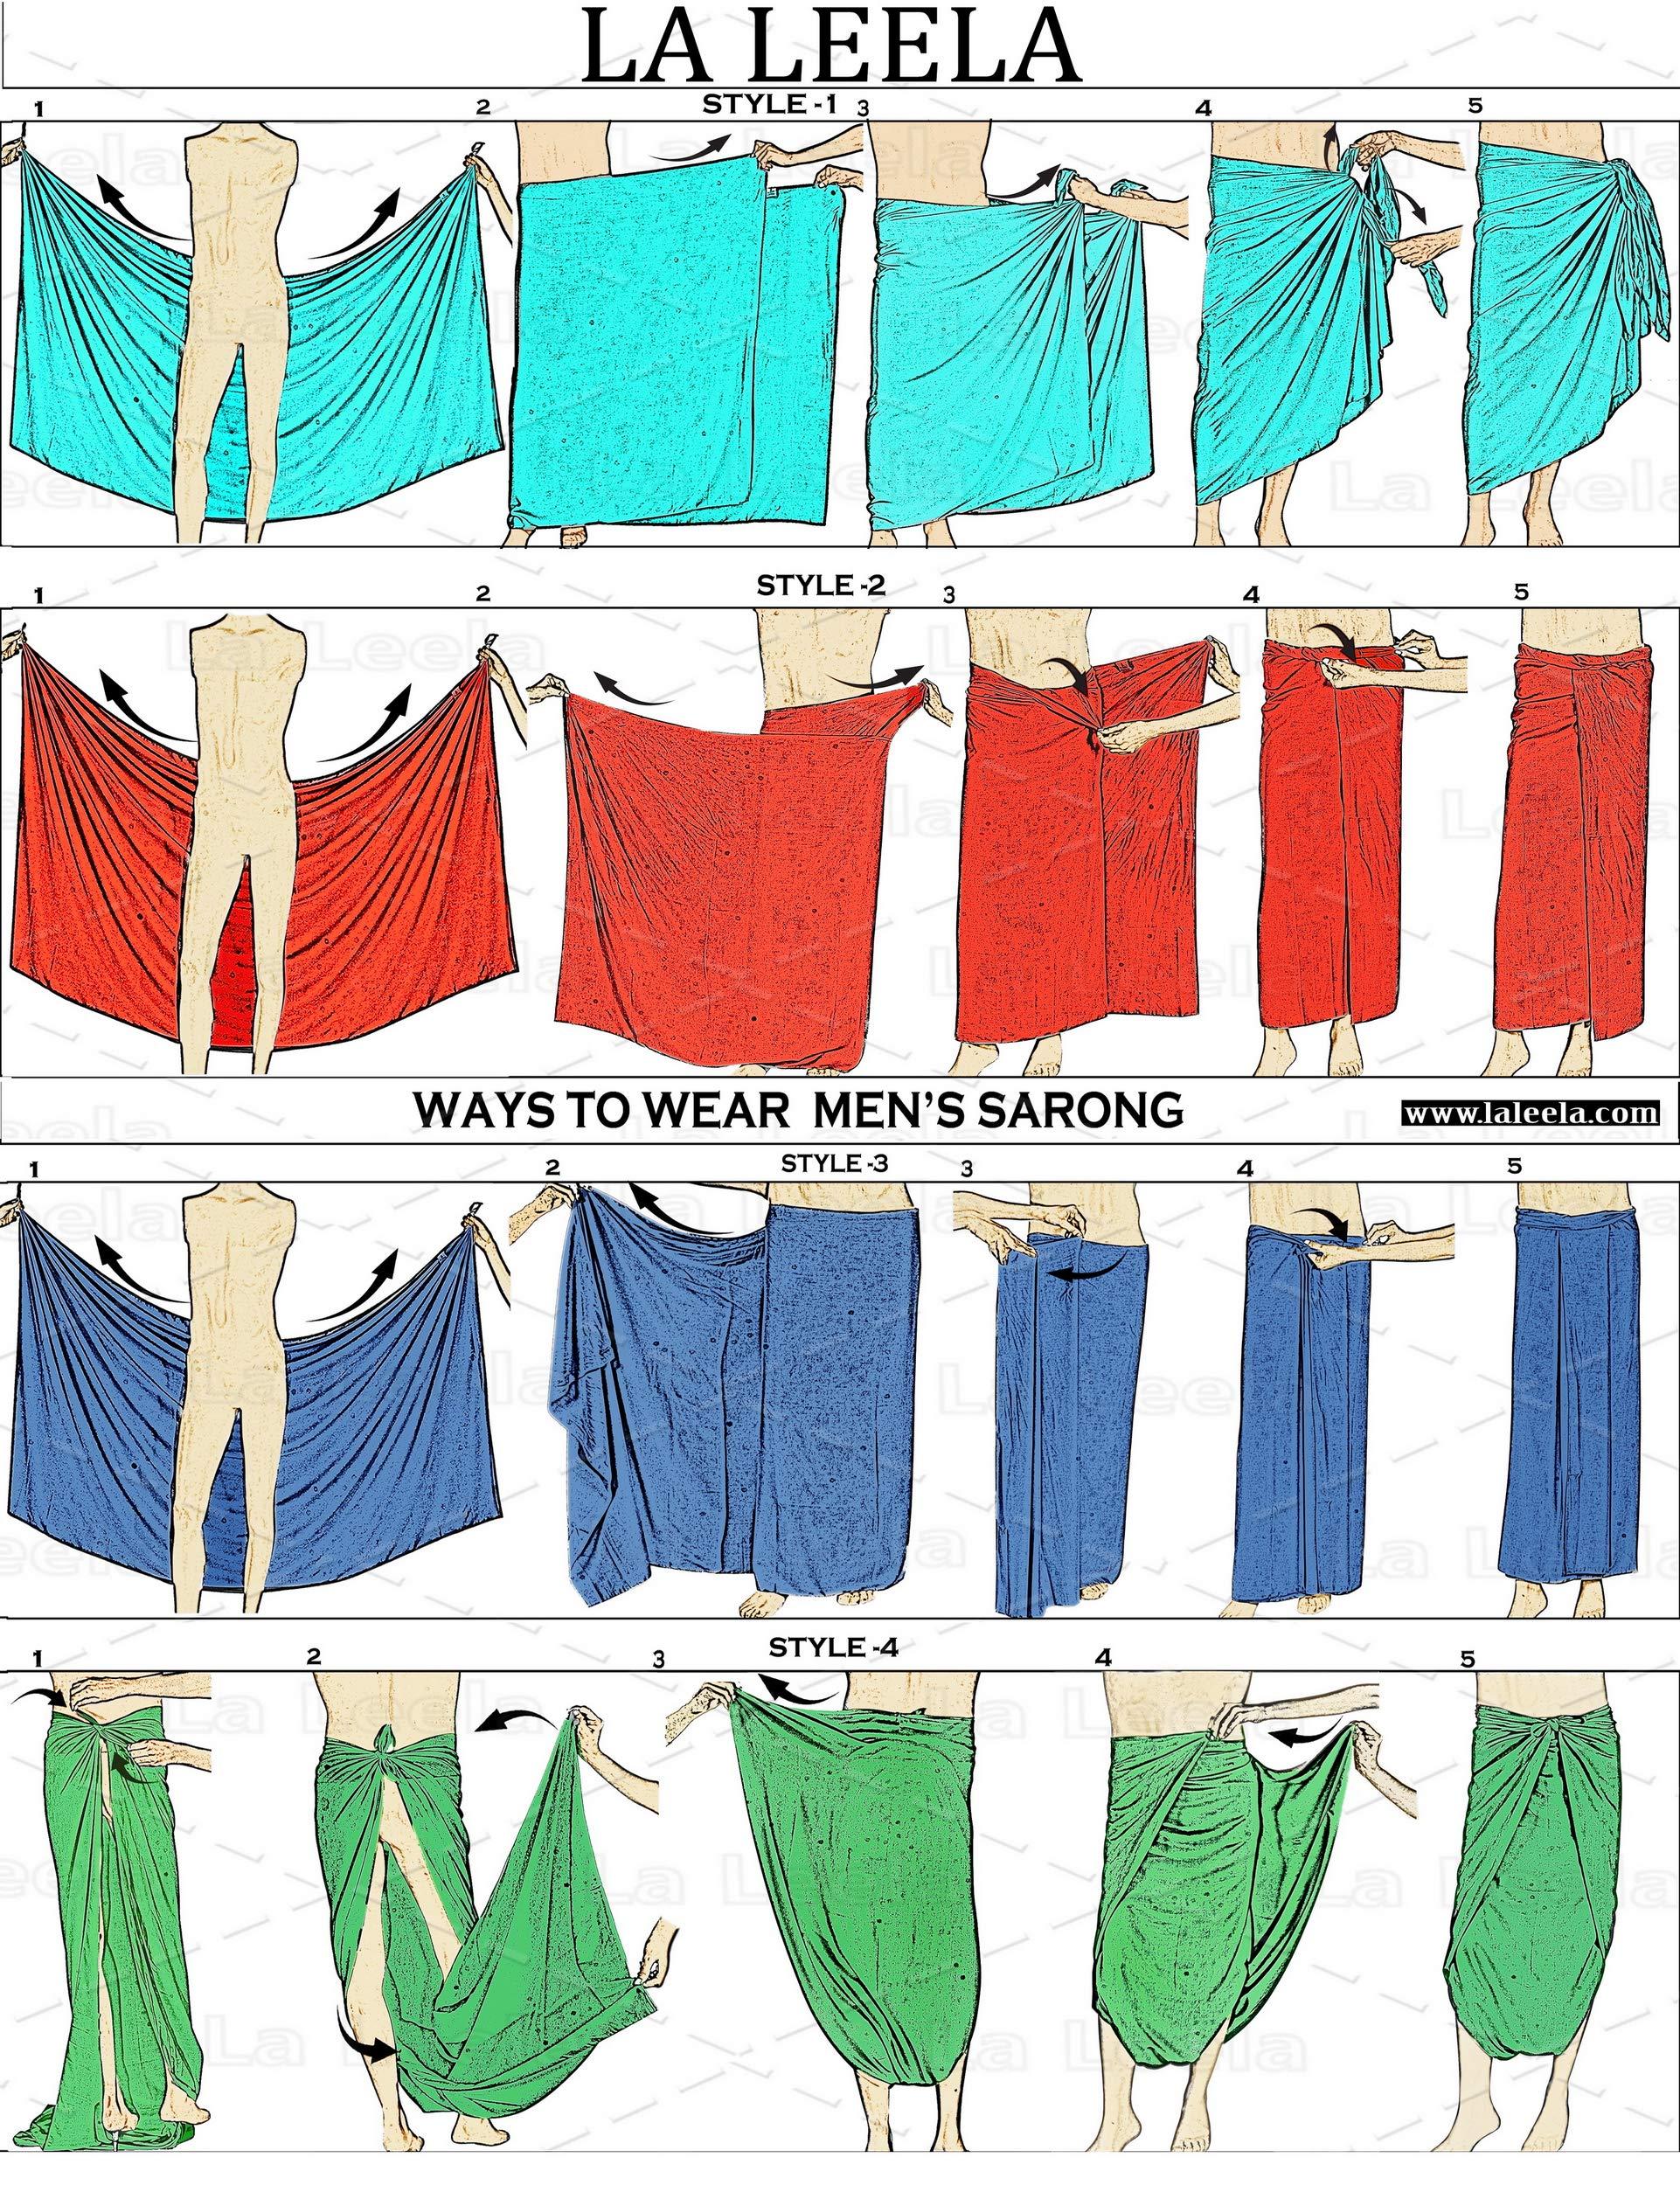 LA LEELA Beachwear Swimwear Sarong Coprire Legame Pareo ordito 5 spesavip